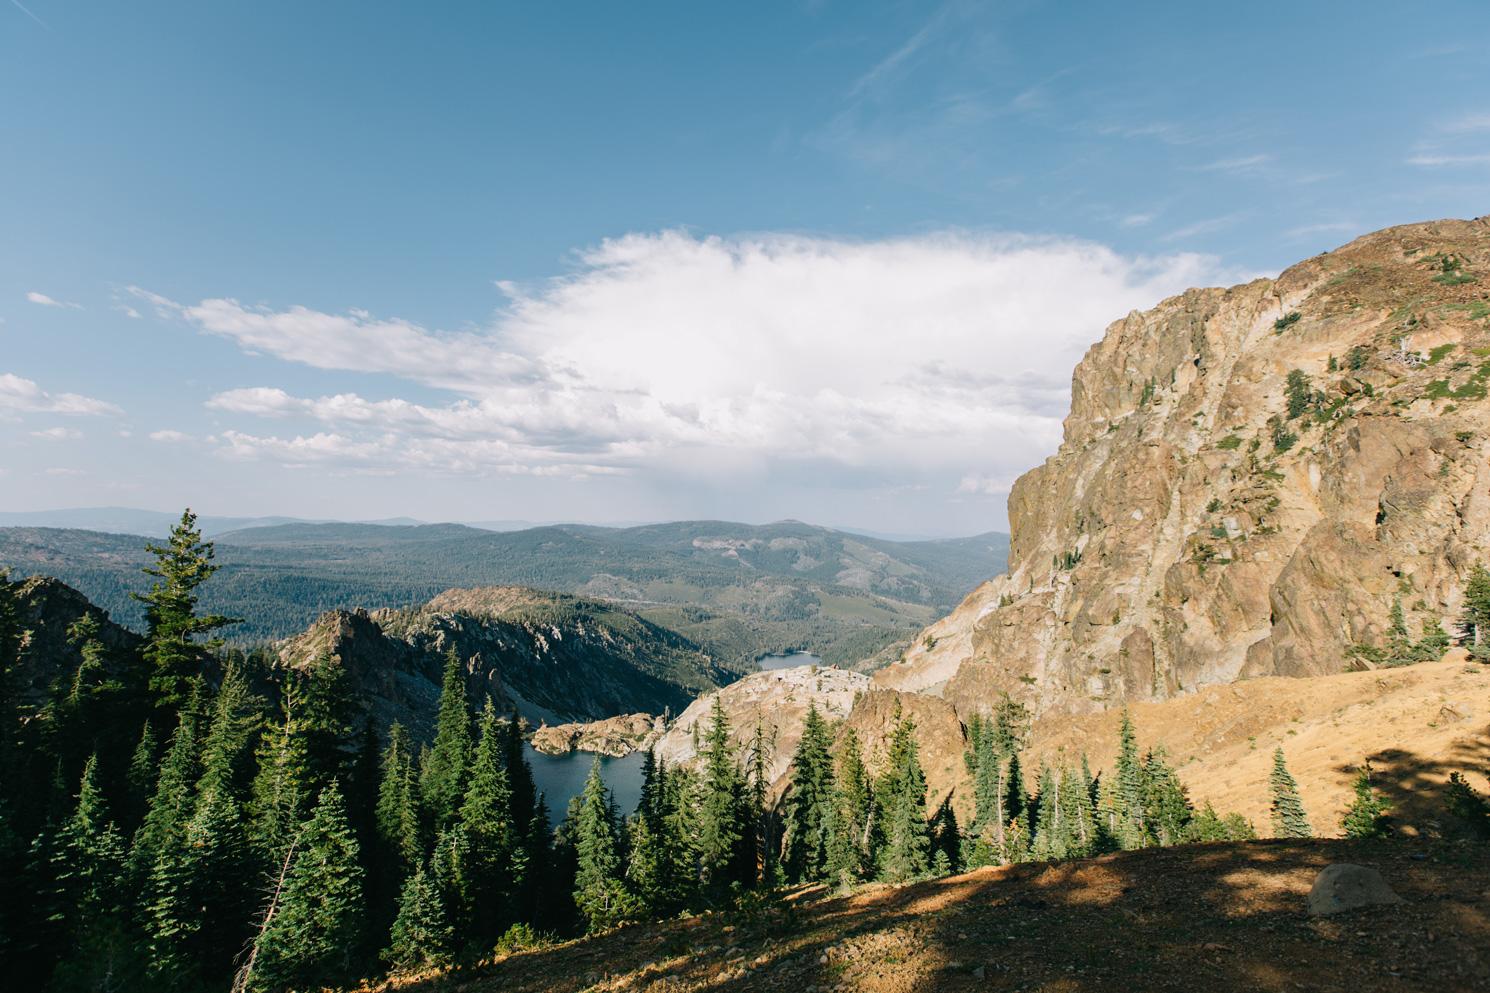 CindyGiovagnoli_outdoors_photographer_Sierra_Buttes_firetower_watchtower_Sardine_Snag_Bear_lake_hike_swim_camp-039.jpg